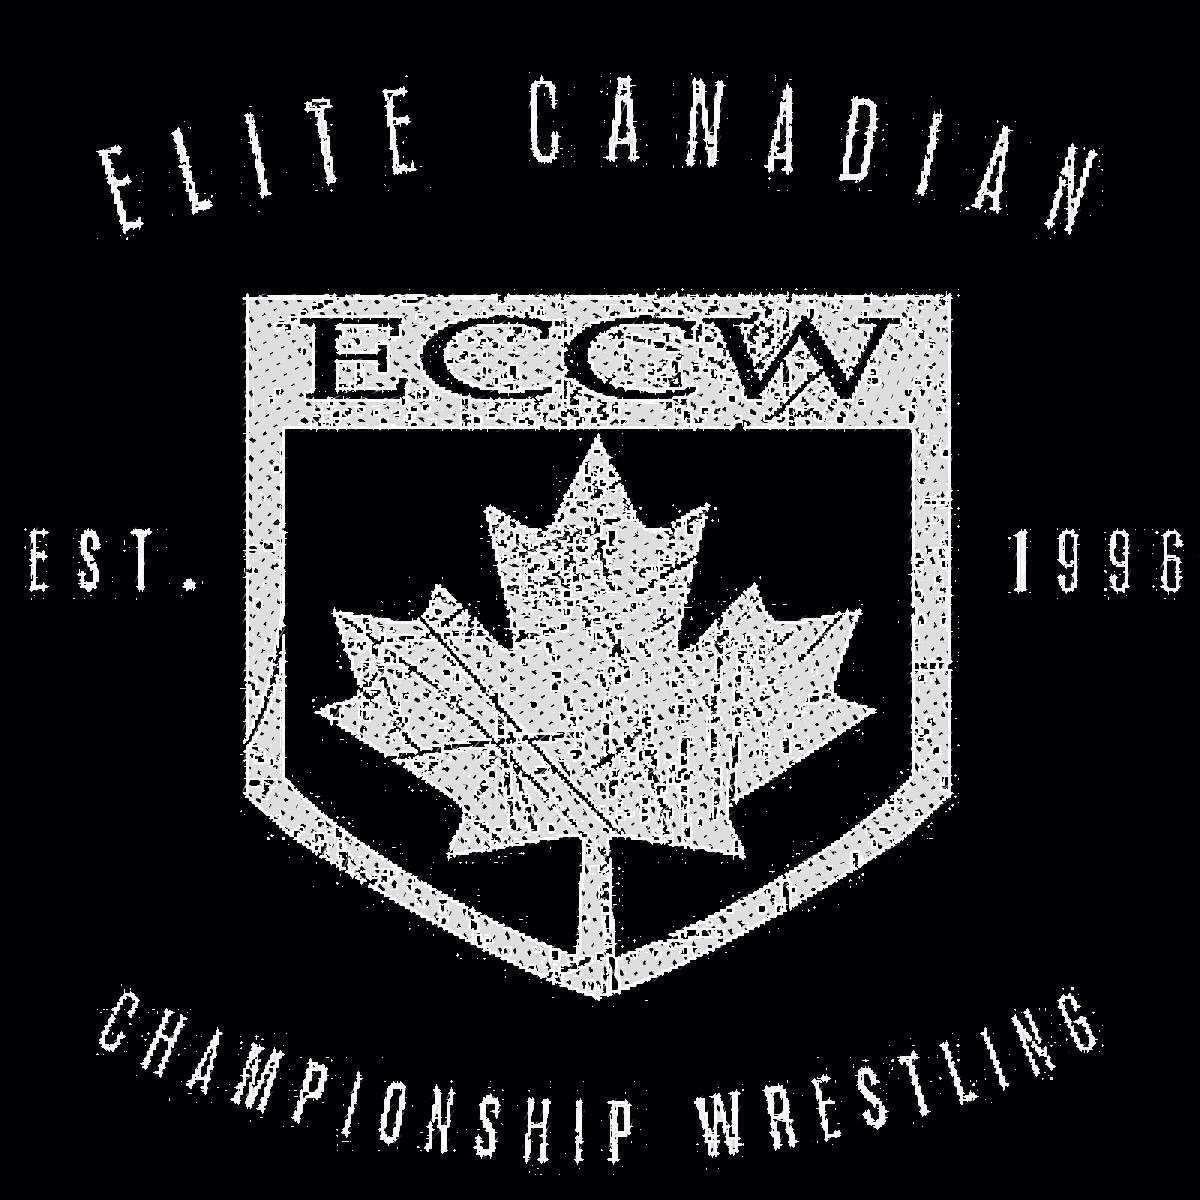 ECCW Logo white on black.JPG